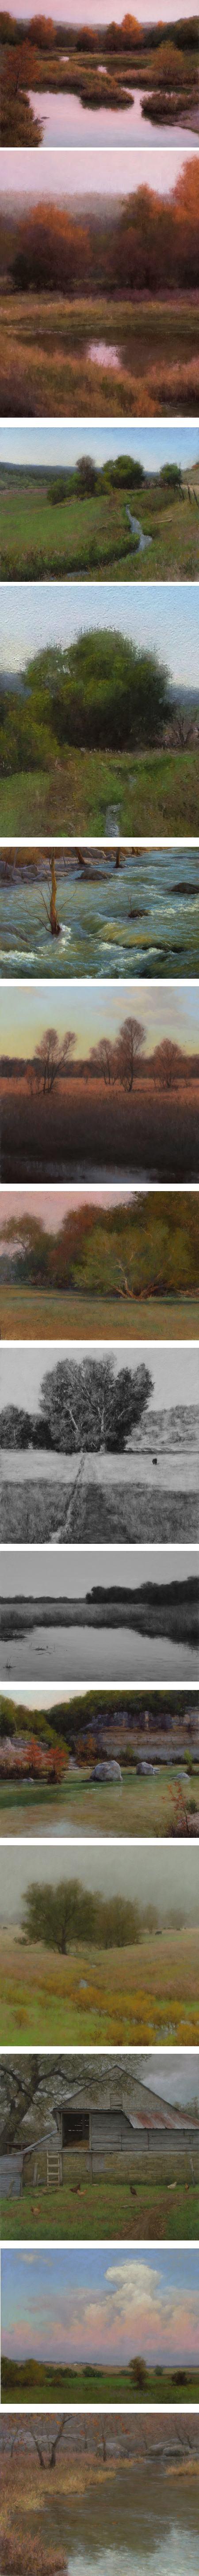 Denise La Rue Mahlke, pastel landscapes